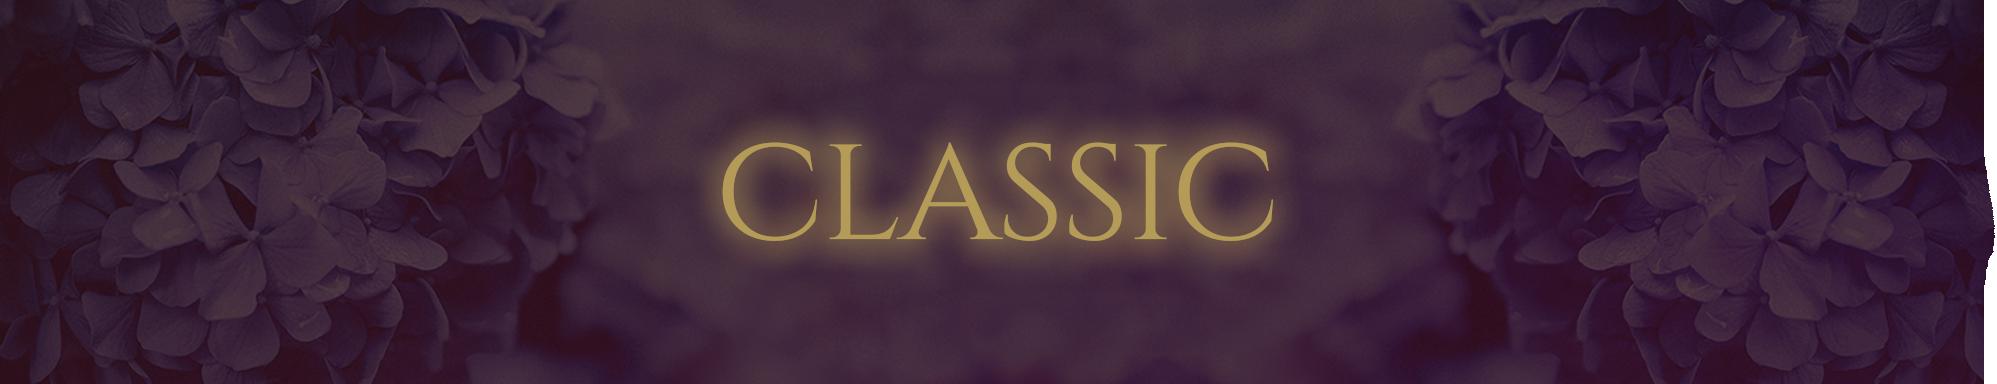 FRIDA. Classic Banner.png